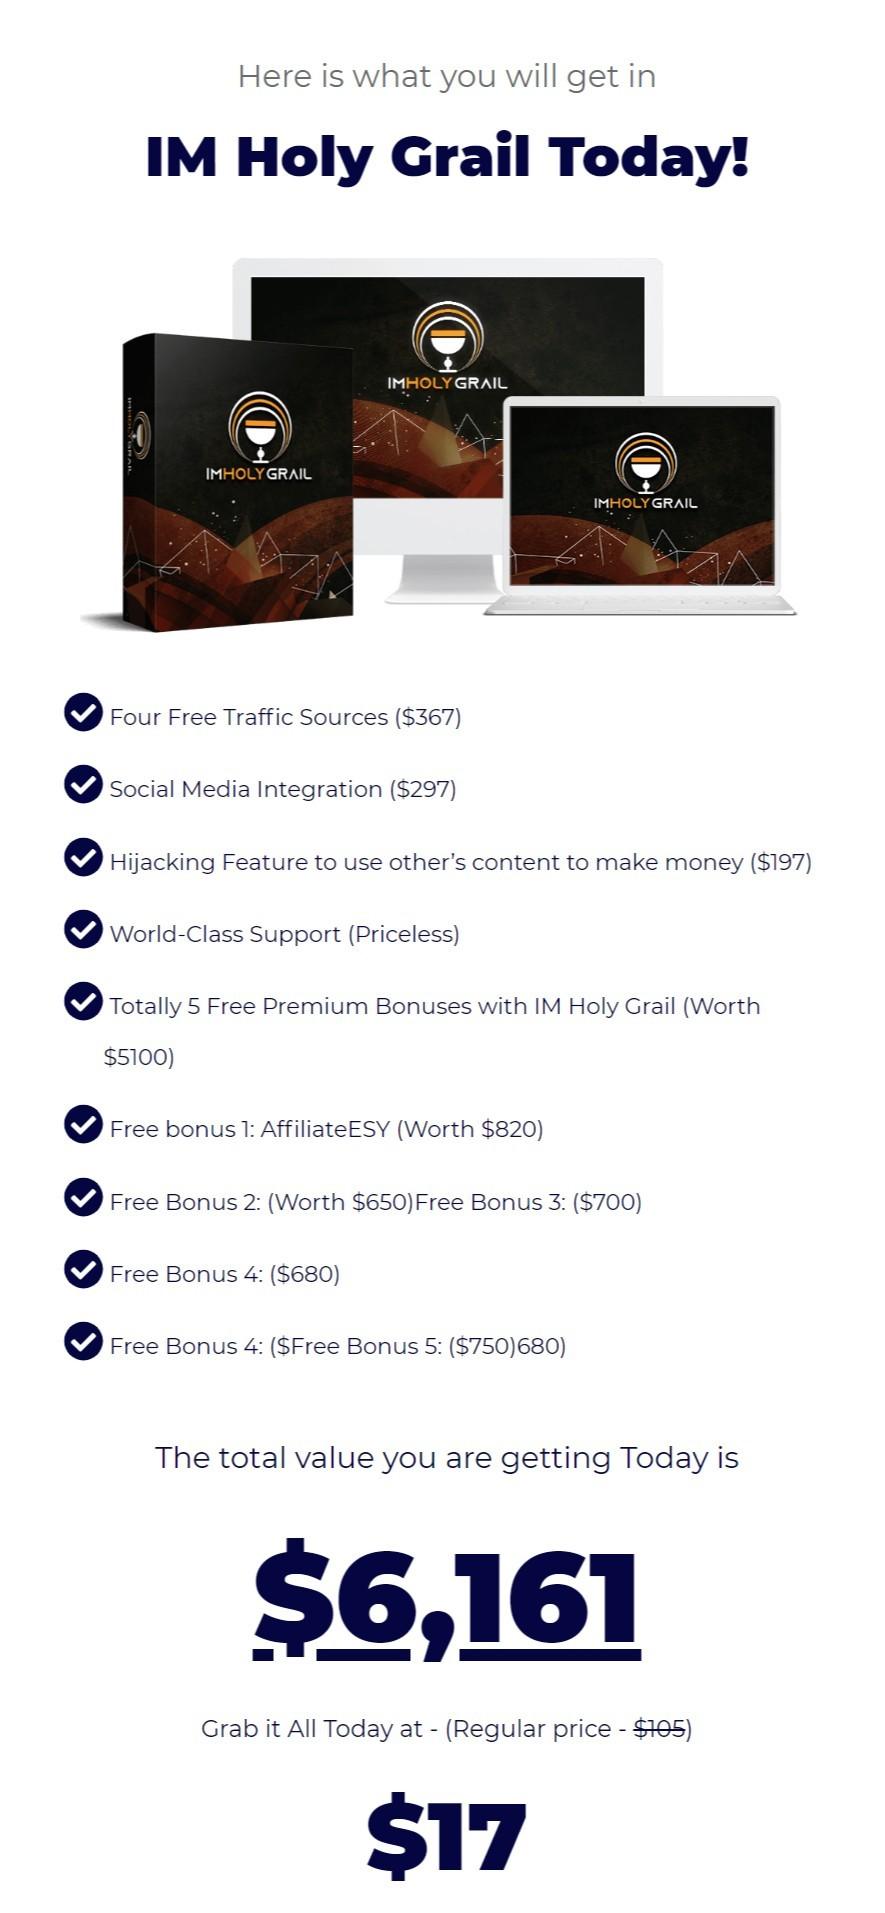 IM-Holy-Grail-price-1